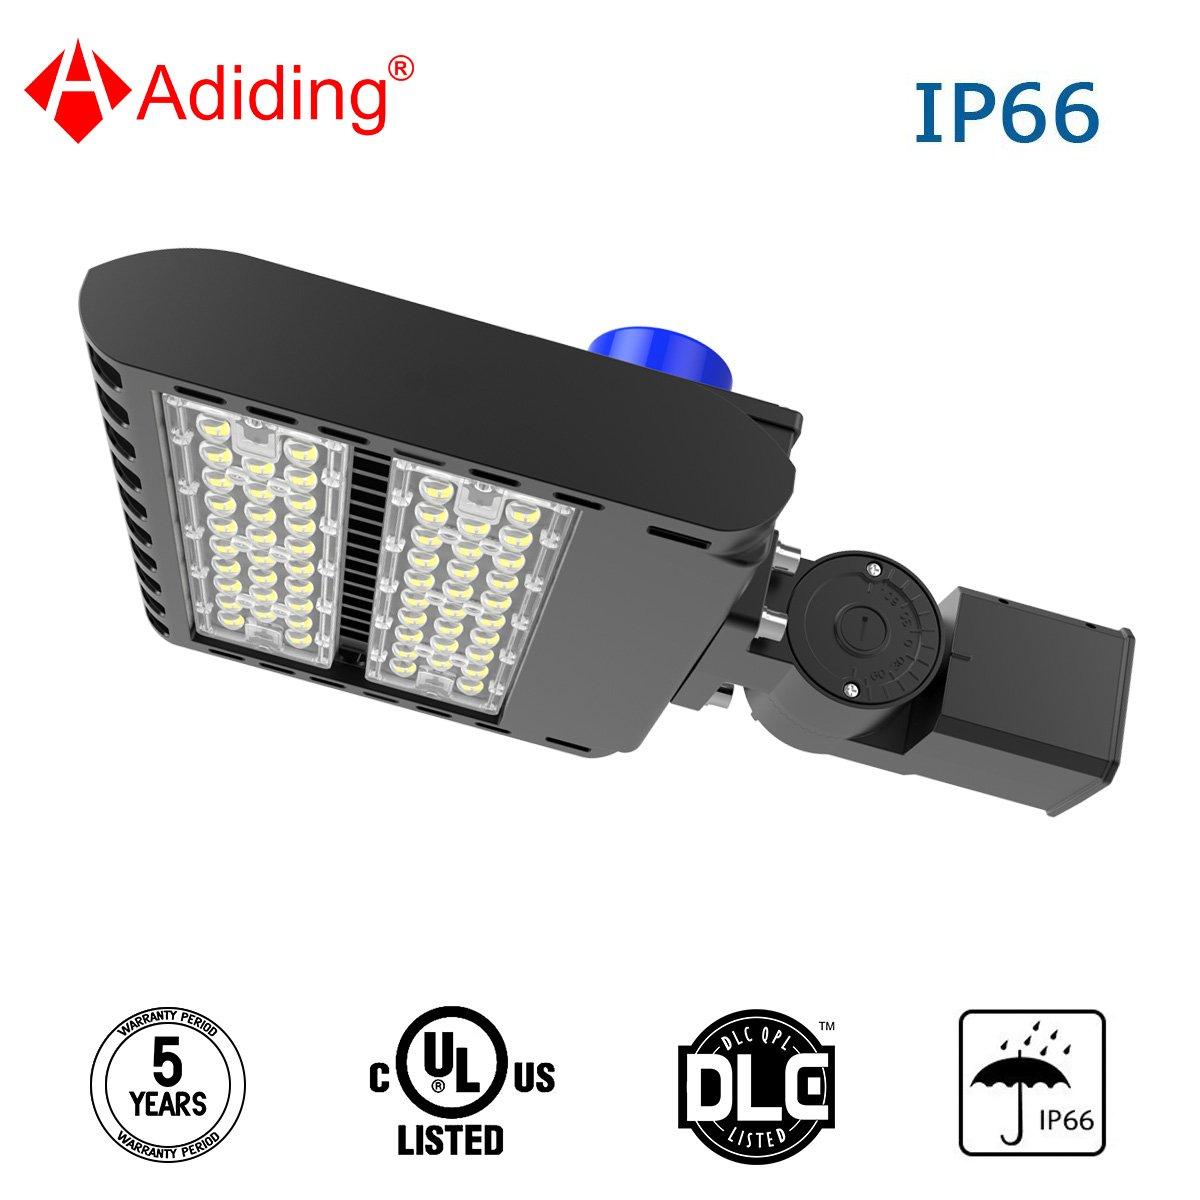 Parking Lot Lights Design: Adiding LED Parking Lot Light 3-Type Mounts 150W Street